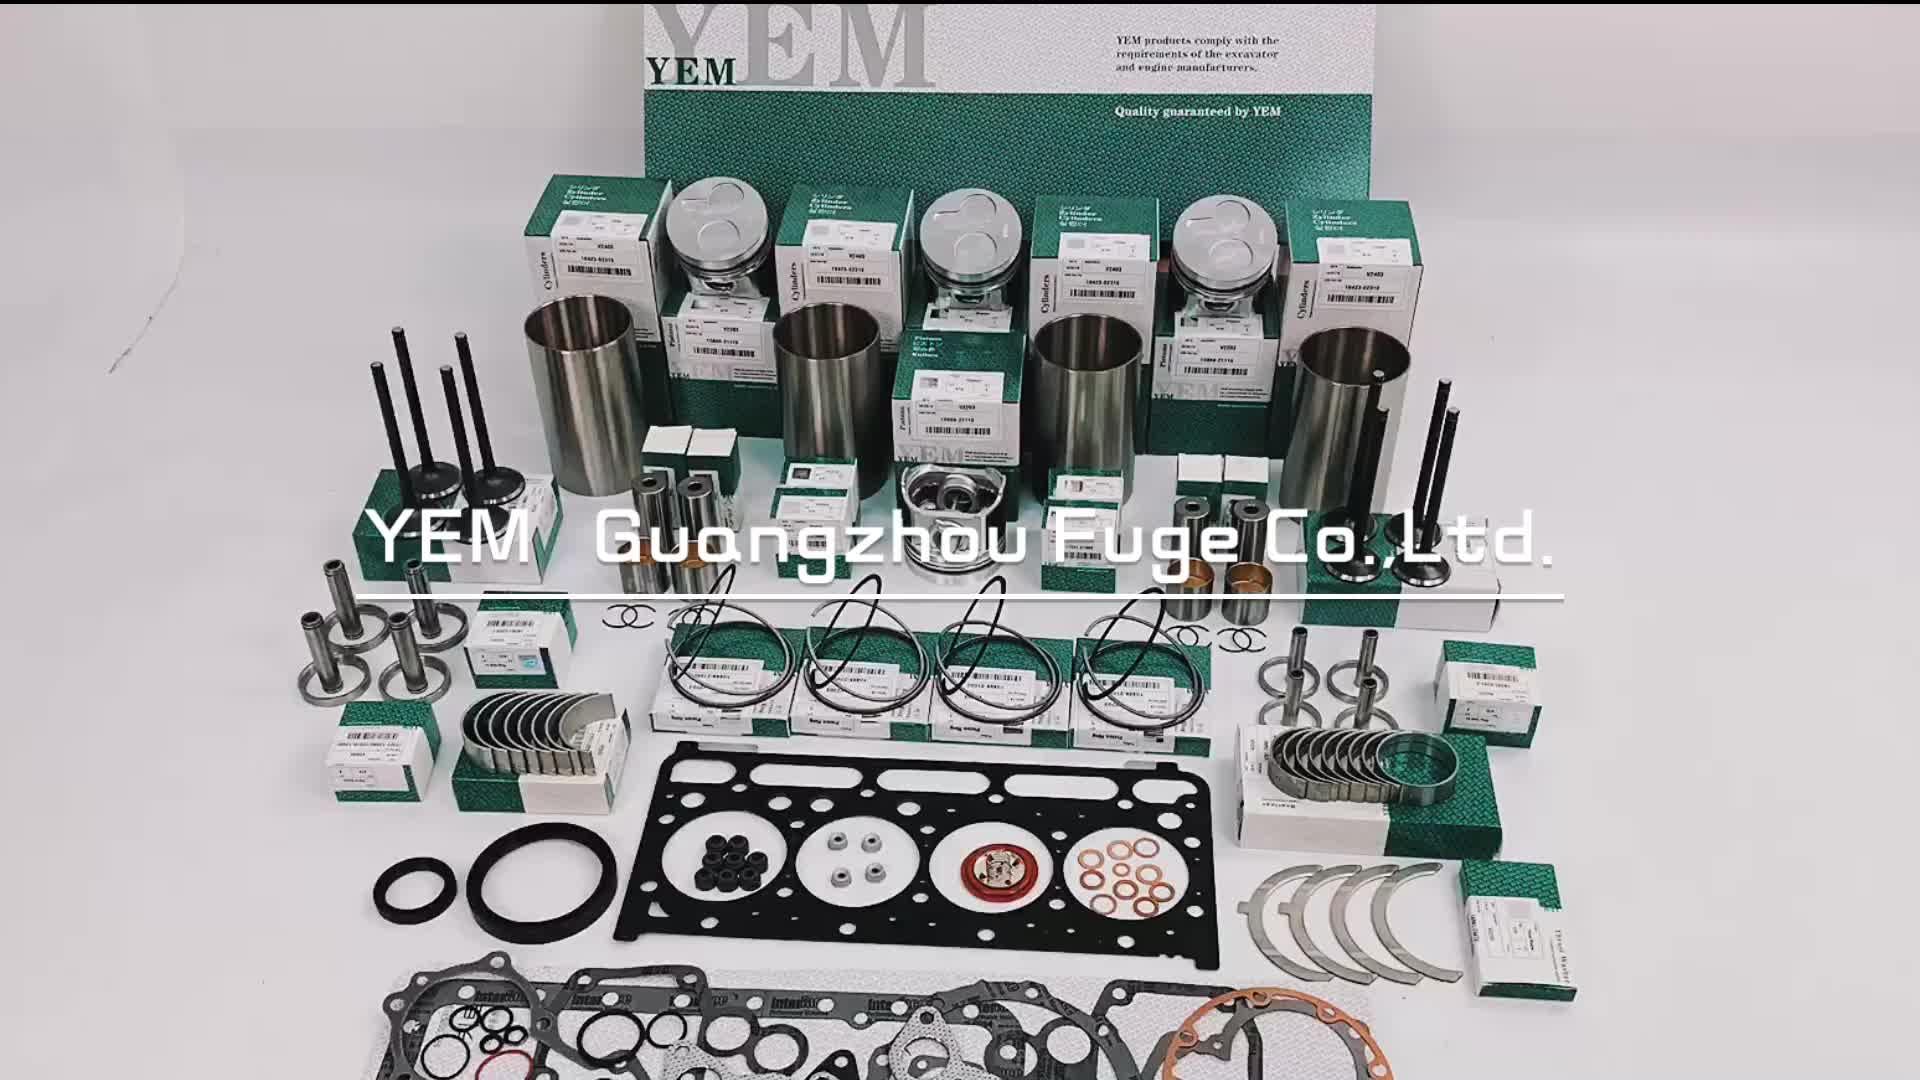 Diesel Engine V2203 Overhaul Kit With Full Gasket Set Engine Bearing Valves For Kubota Engine